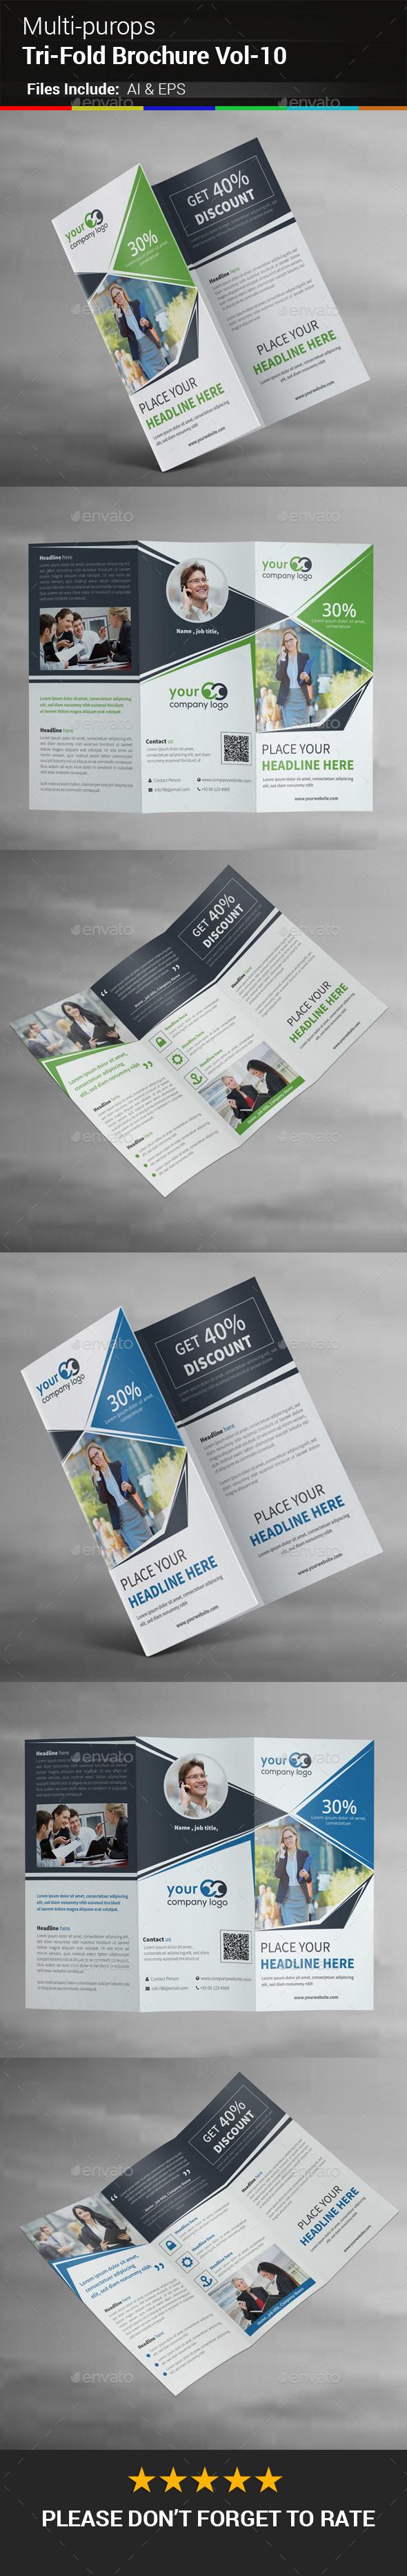 Multipurpose Business Tri-Fold Brochure Vol-10 - Corporate Brochures